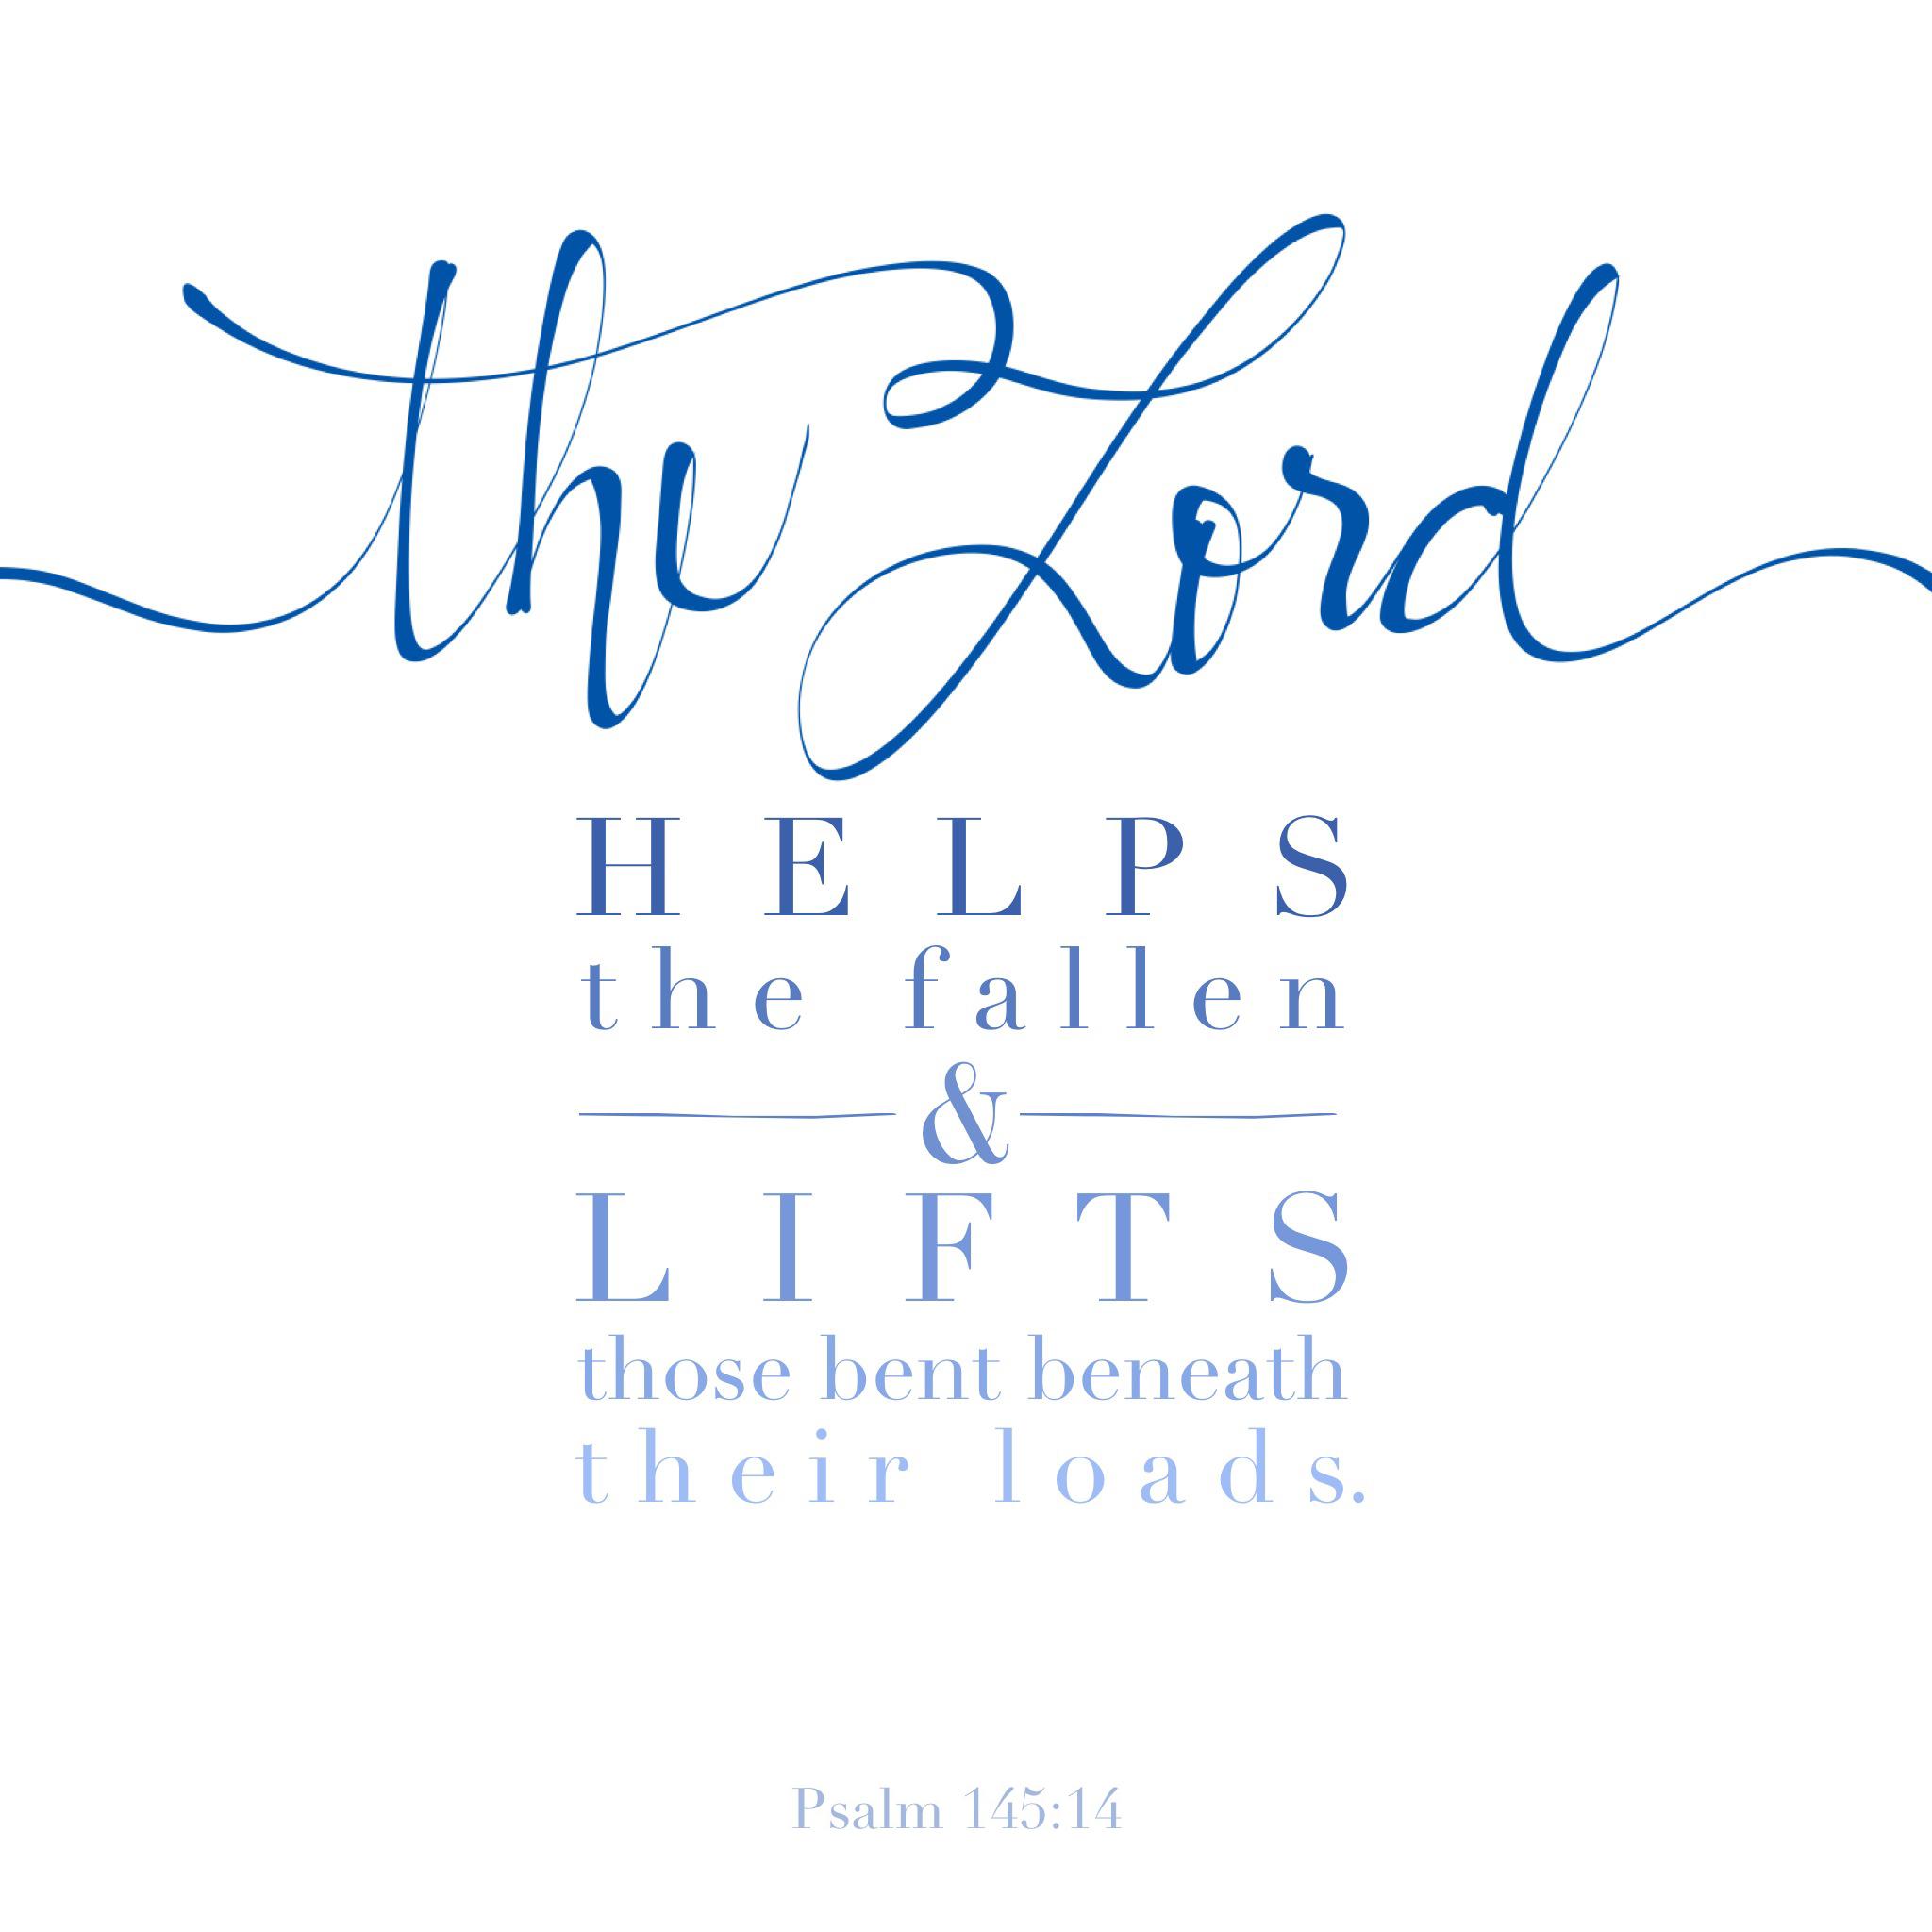 Psalm 145:14